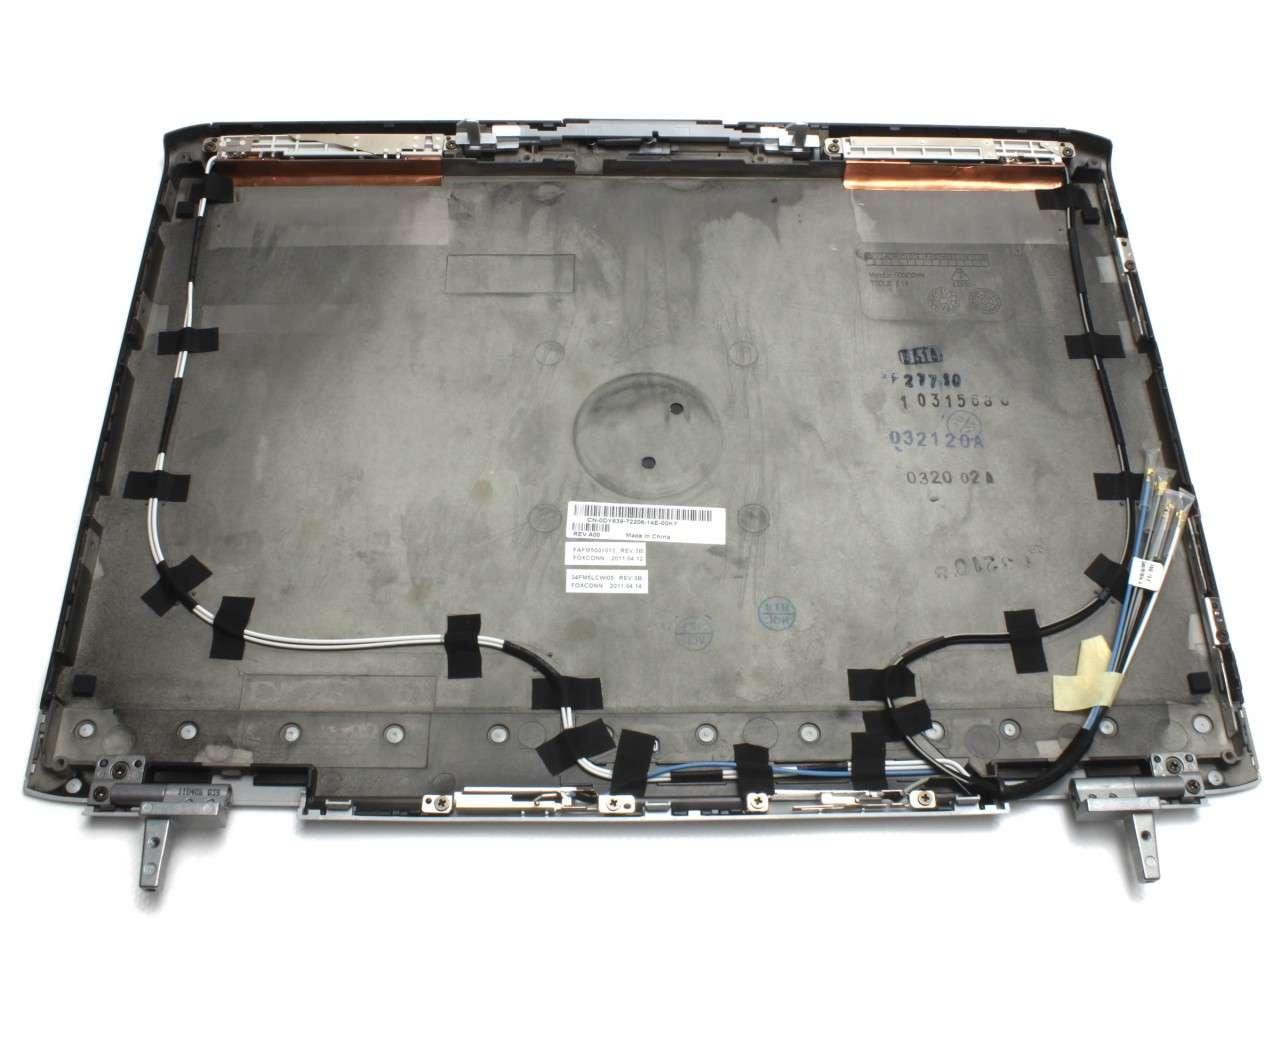 Capac Display BackCover Dell Inspiron 1520 Carcasa Display imagine powerlaptop.ro 2021